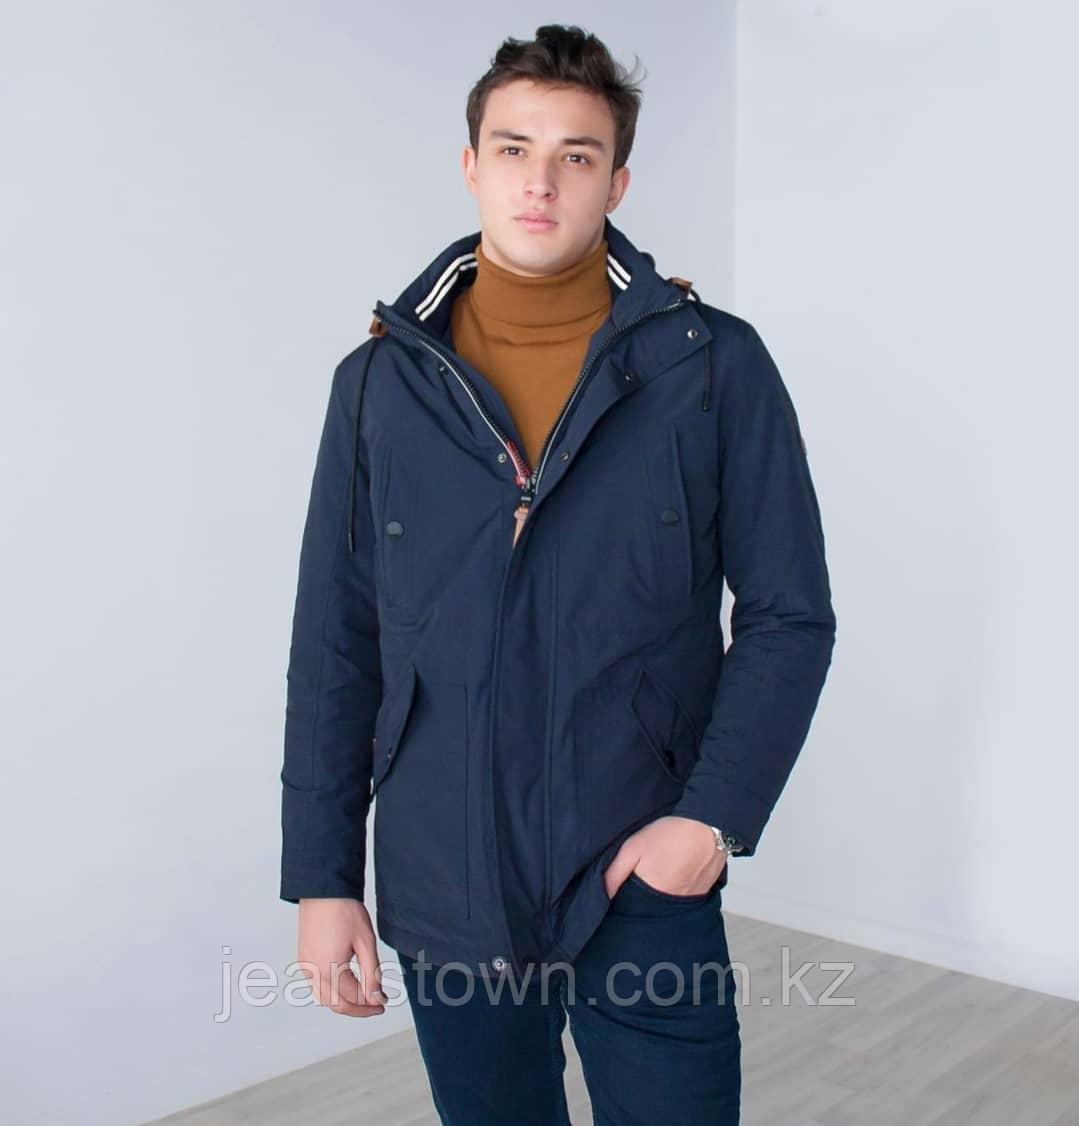 Куртка мужская  демисезонная  Kings Wind  темно-синяя